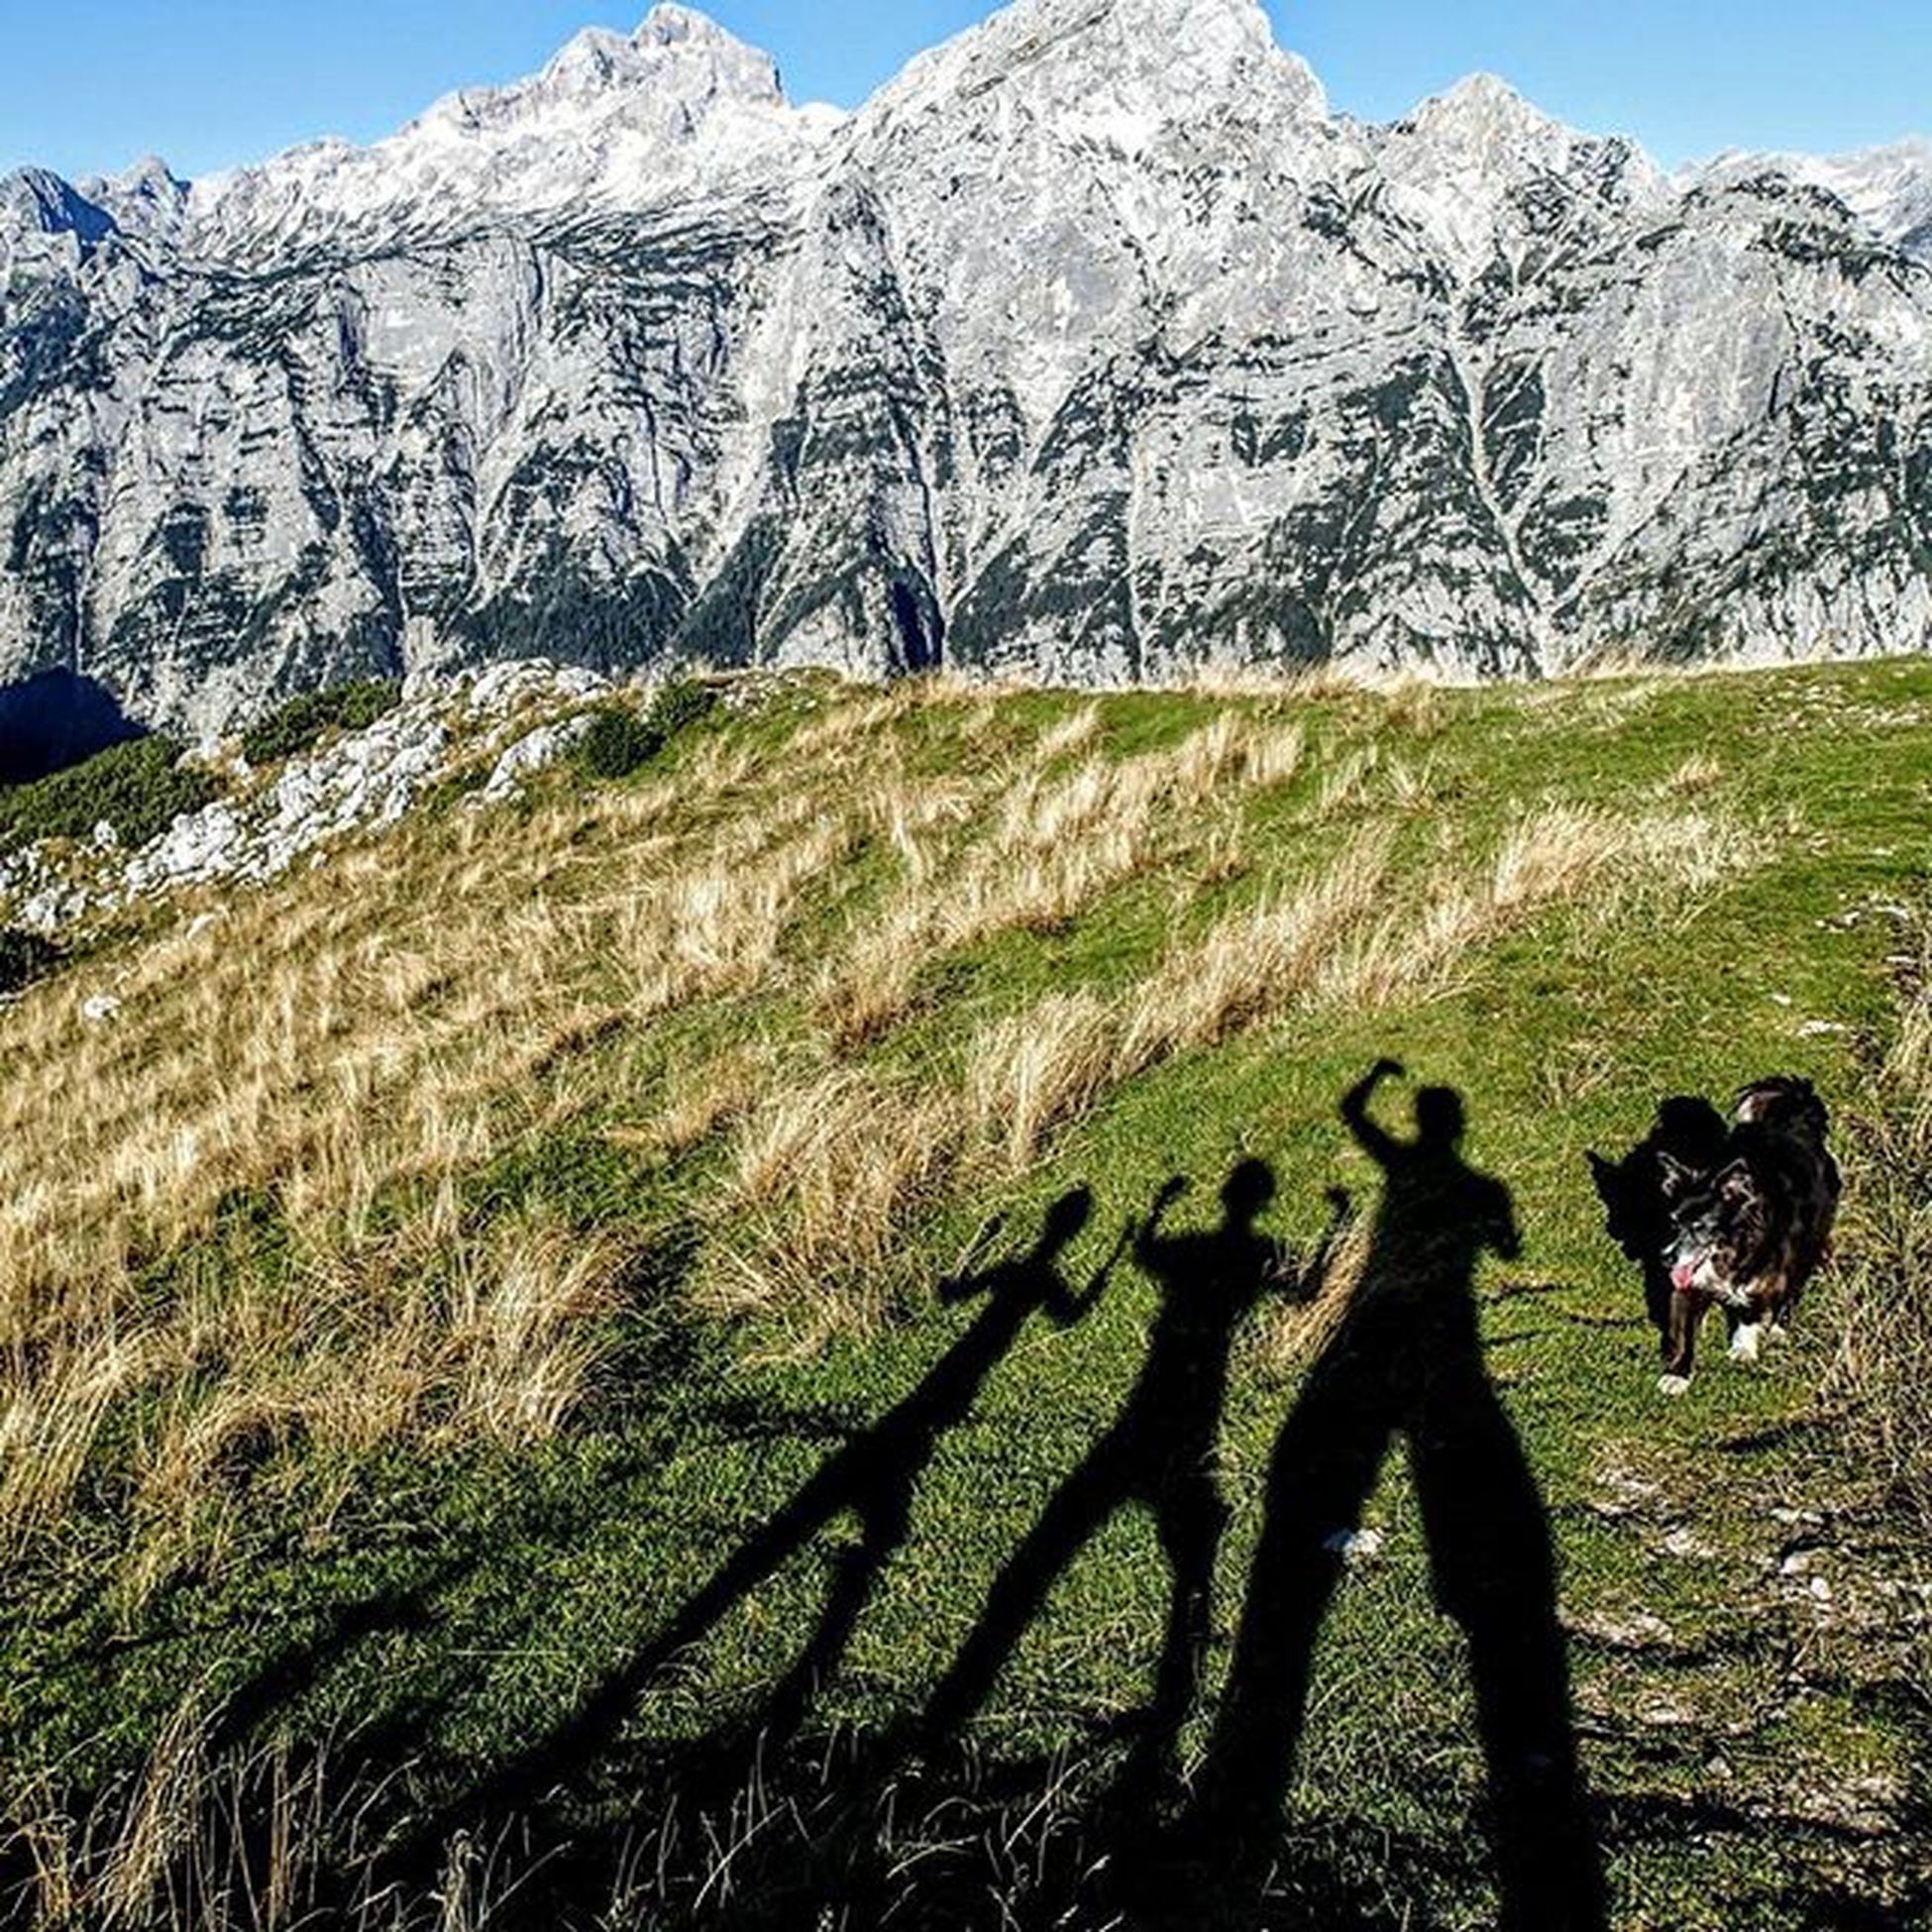 Debelapec Triglav Rjavina Julijskealpe Julianalps Alps IfeelsLOVEnia Igslovenia Slovenija Triglavnationalpark Montagne_my_life Mountainworld Alpinebabes Mountaingirls Shadow Loves_mountains Visitslovenia Sportaddict Ig_neverstopexploring Keeponsmiling Lifeisgood Ilovehiking Boardercollie Bestcompany  Perfectday whataview @b_a_c_k_ ocistimogore razmerevgorah pLaygroUnD 💚💚💜💙💙💛💛❤❤